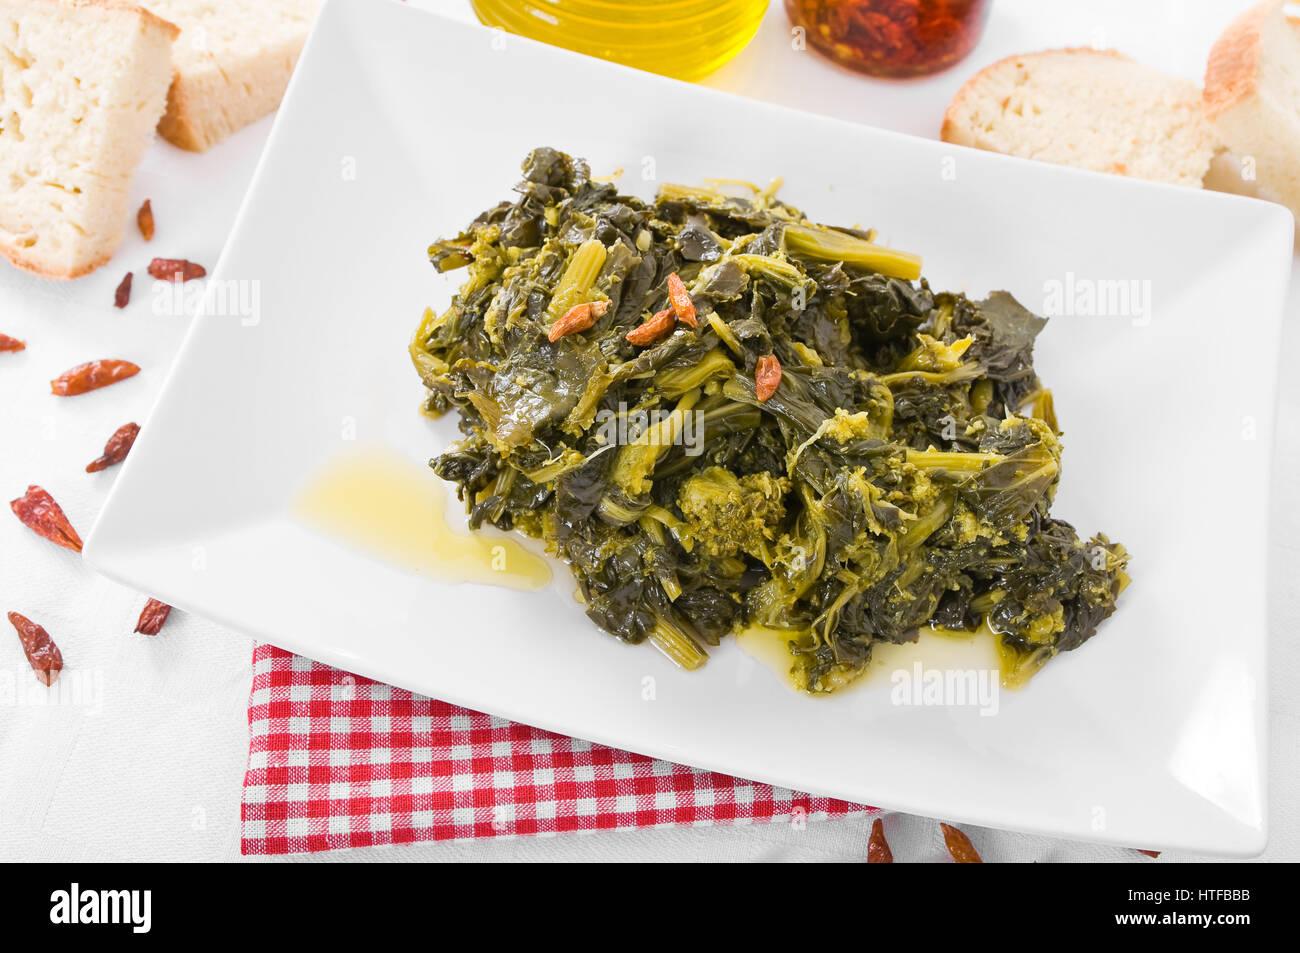 Stewed turnip greens. - Stock Image